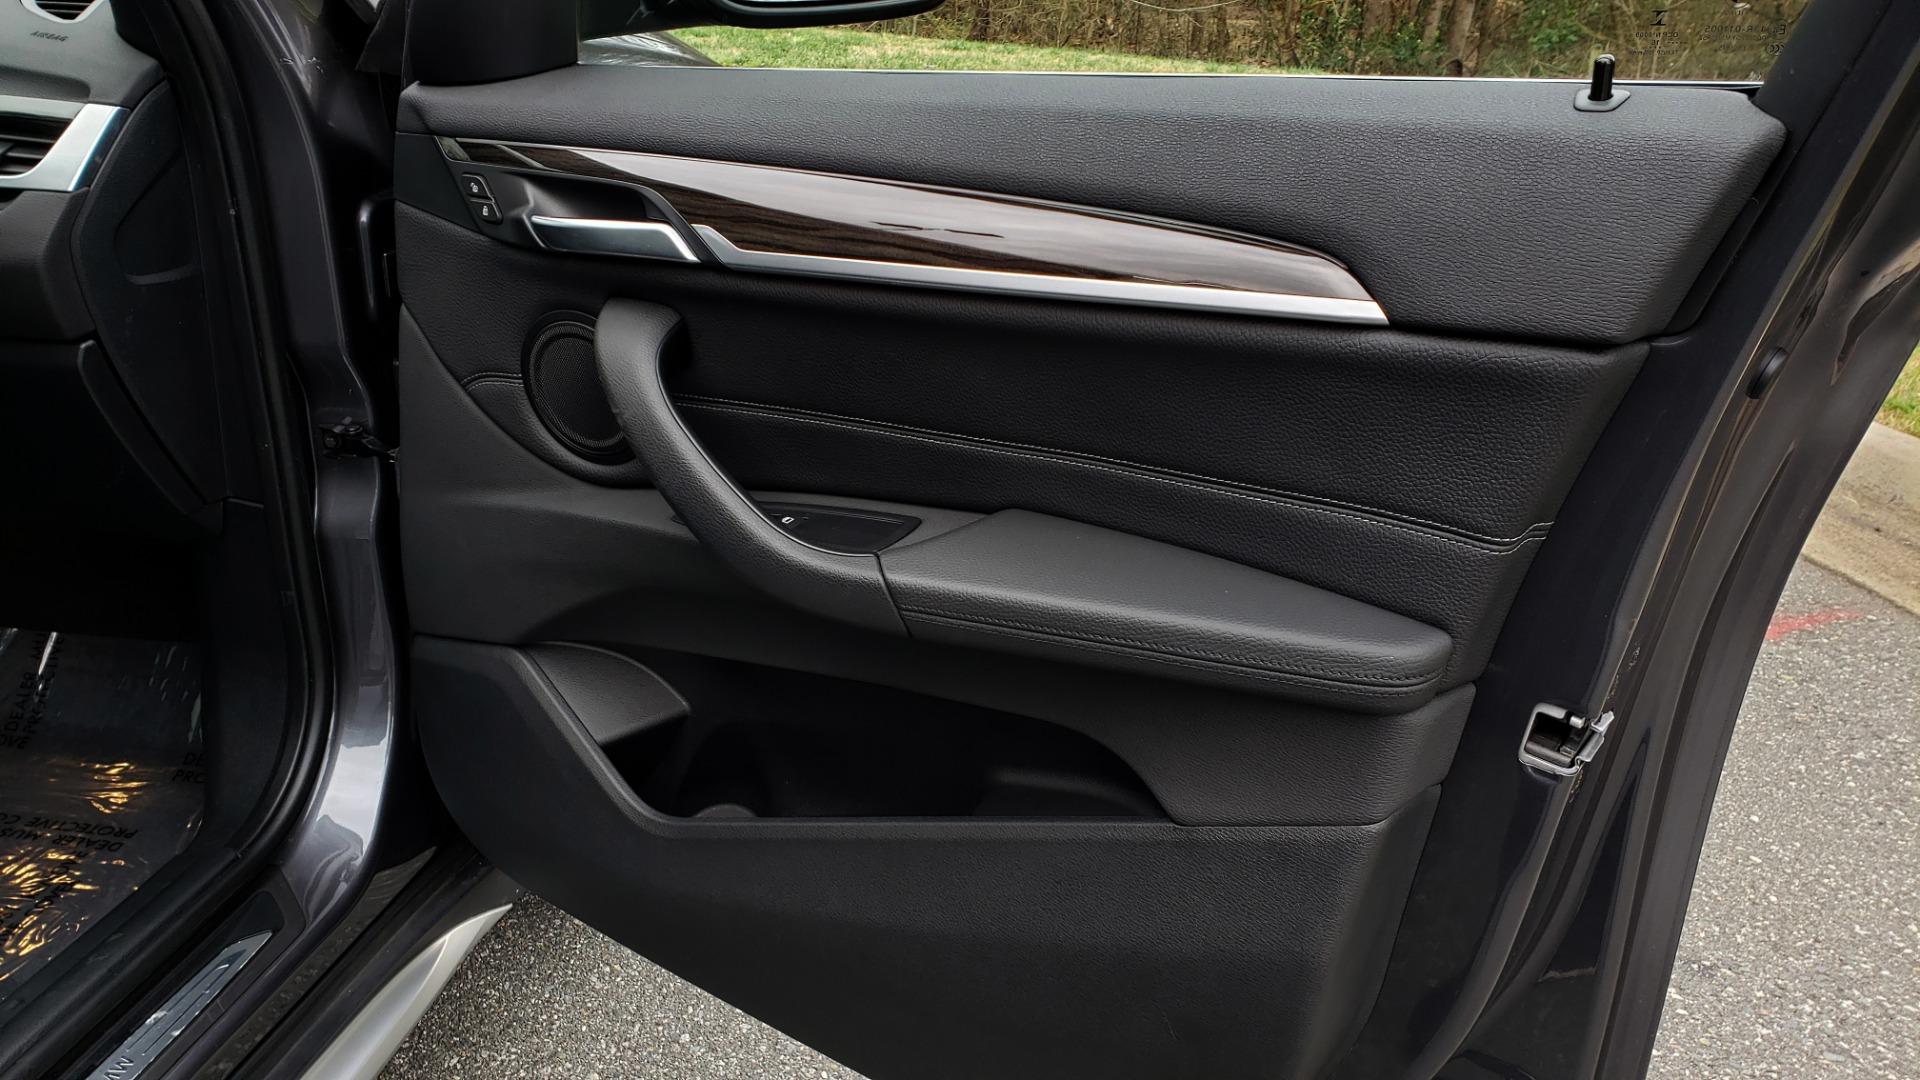 Used 2017 BMW X1 XDRIVE28I / PREM PKG / DRIVER ASST / NAV / CLD WTHR for sale Sold at Formula Imports in Charlotte NC 28227 66